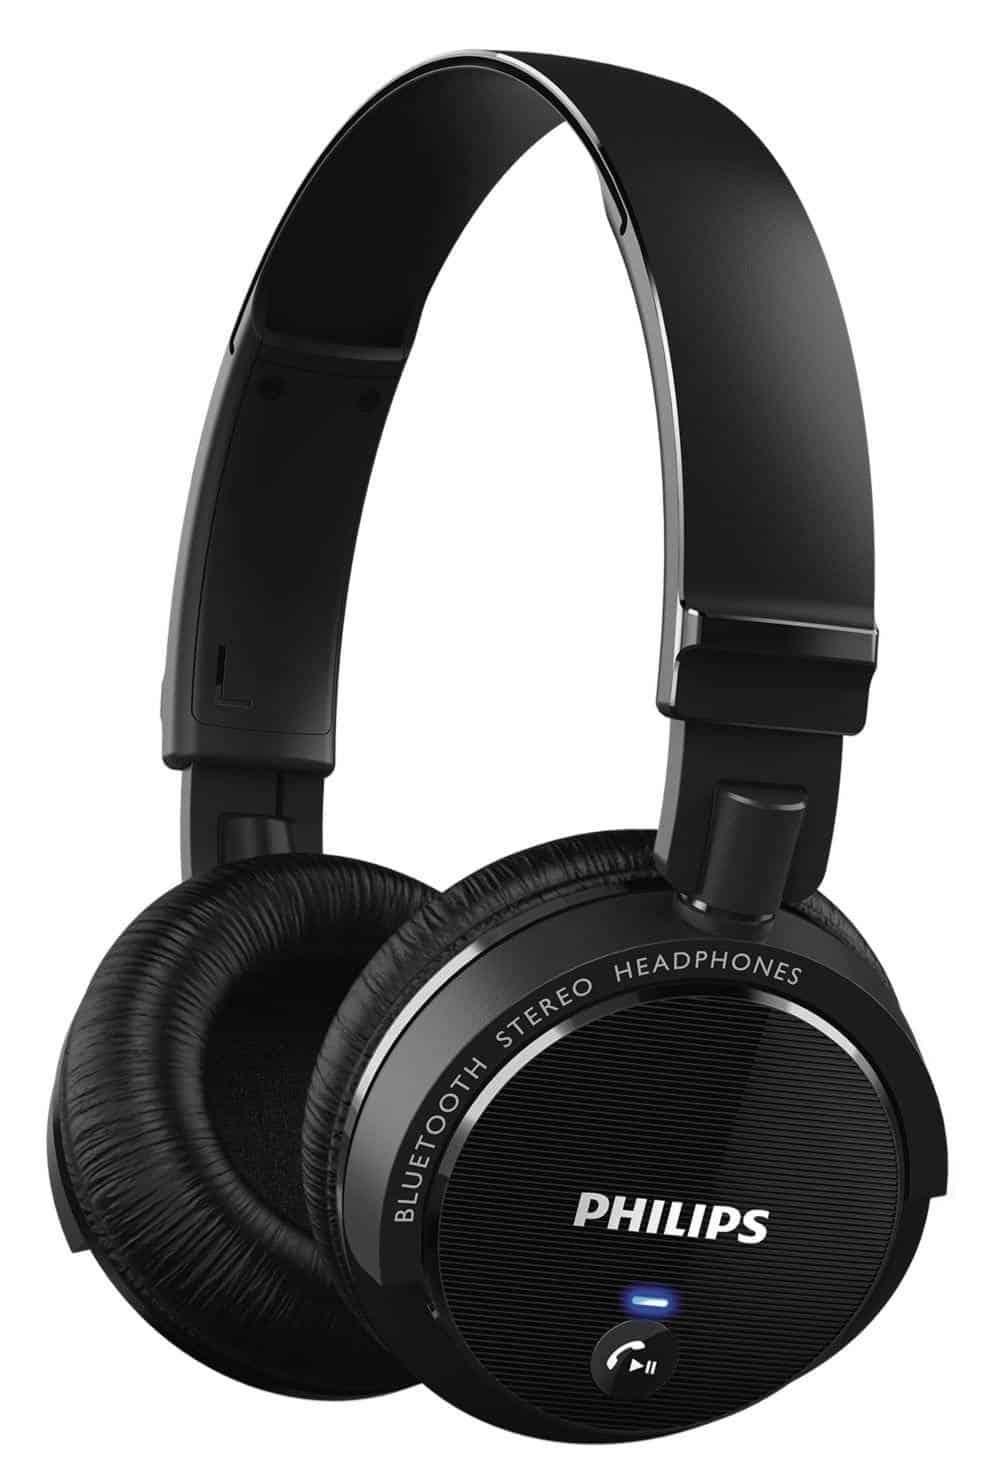 philips-wireless-headphones